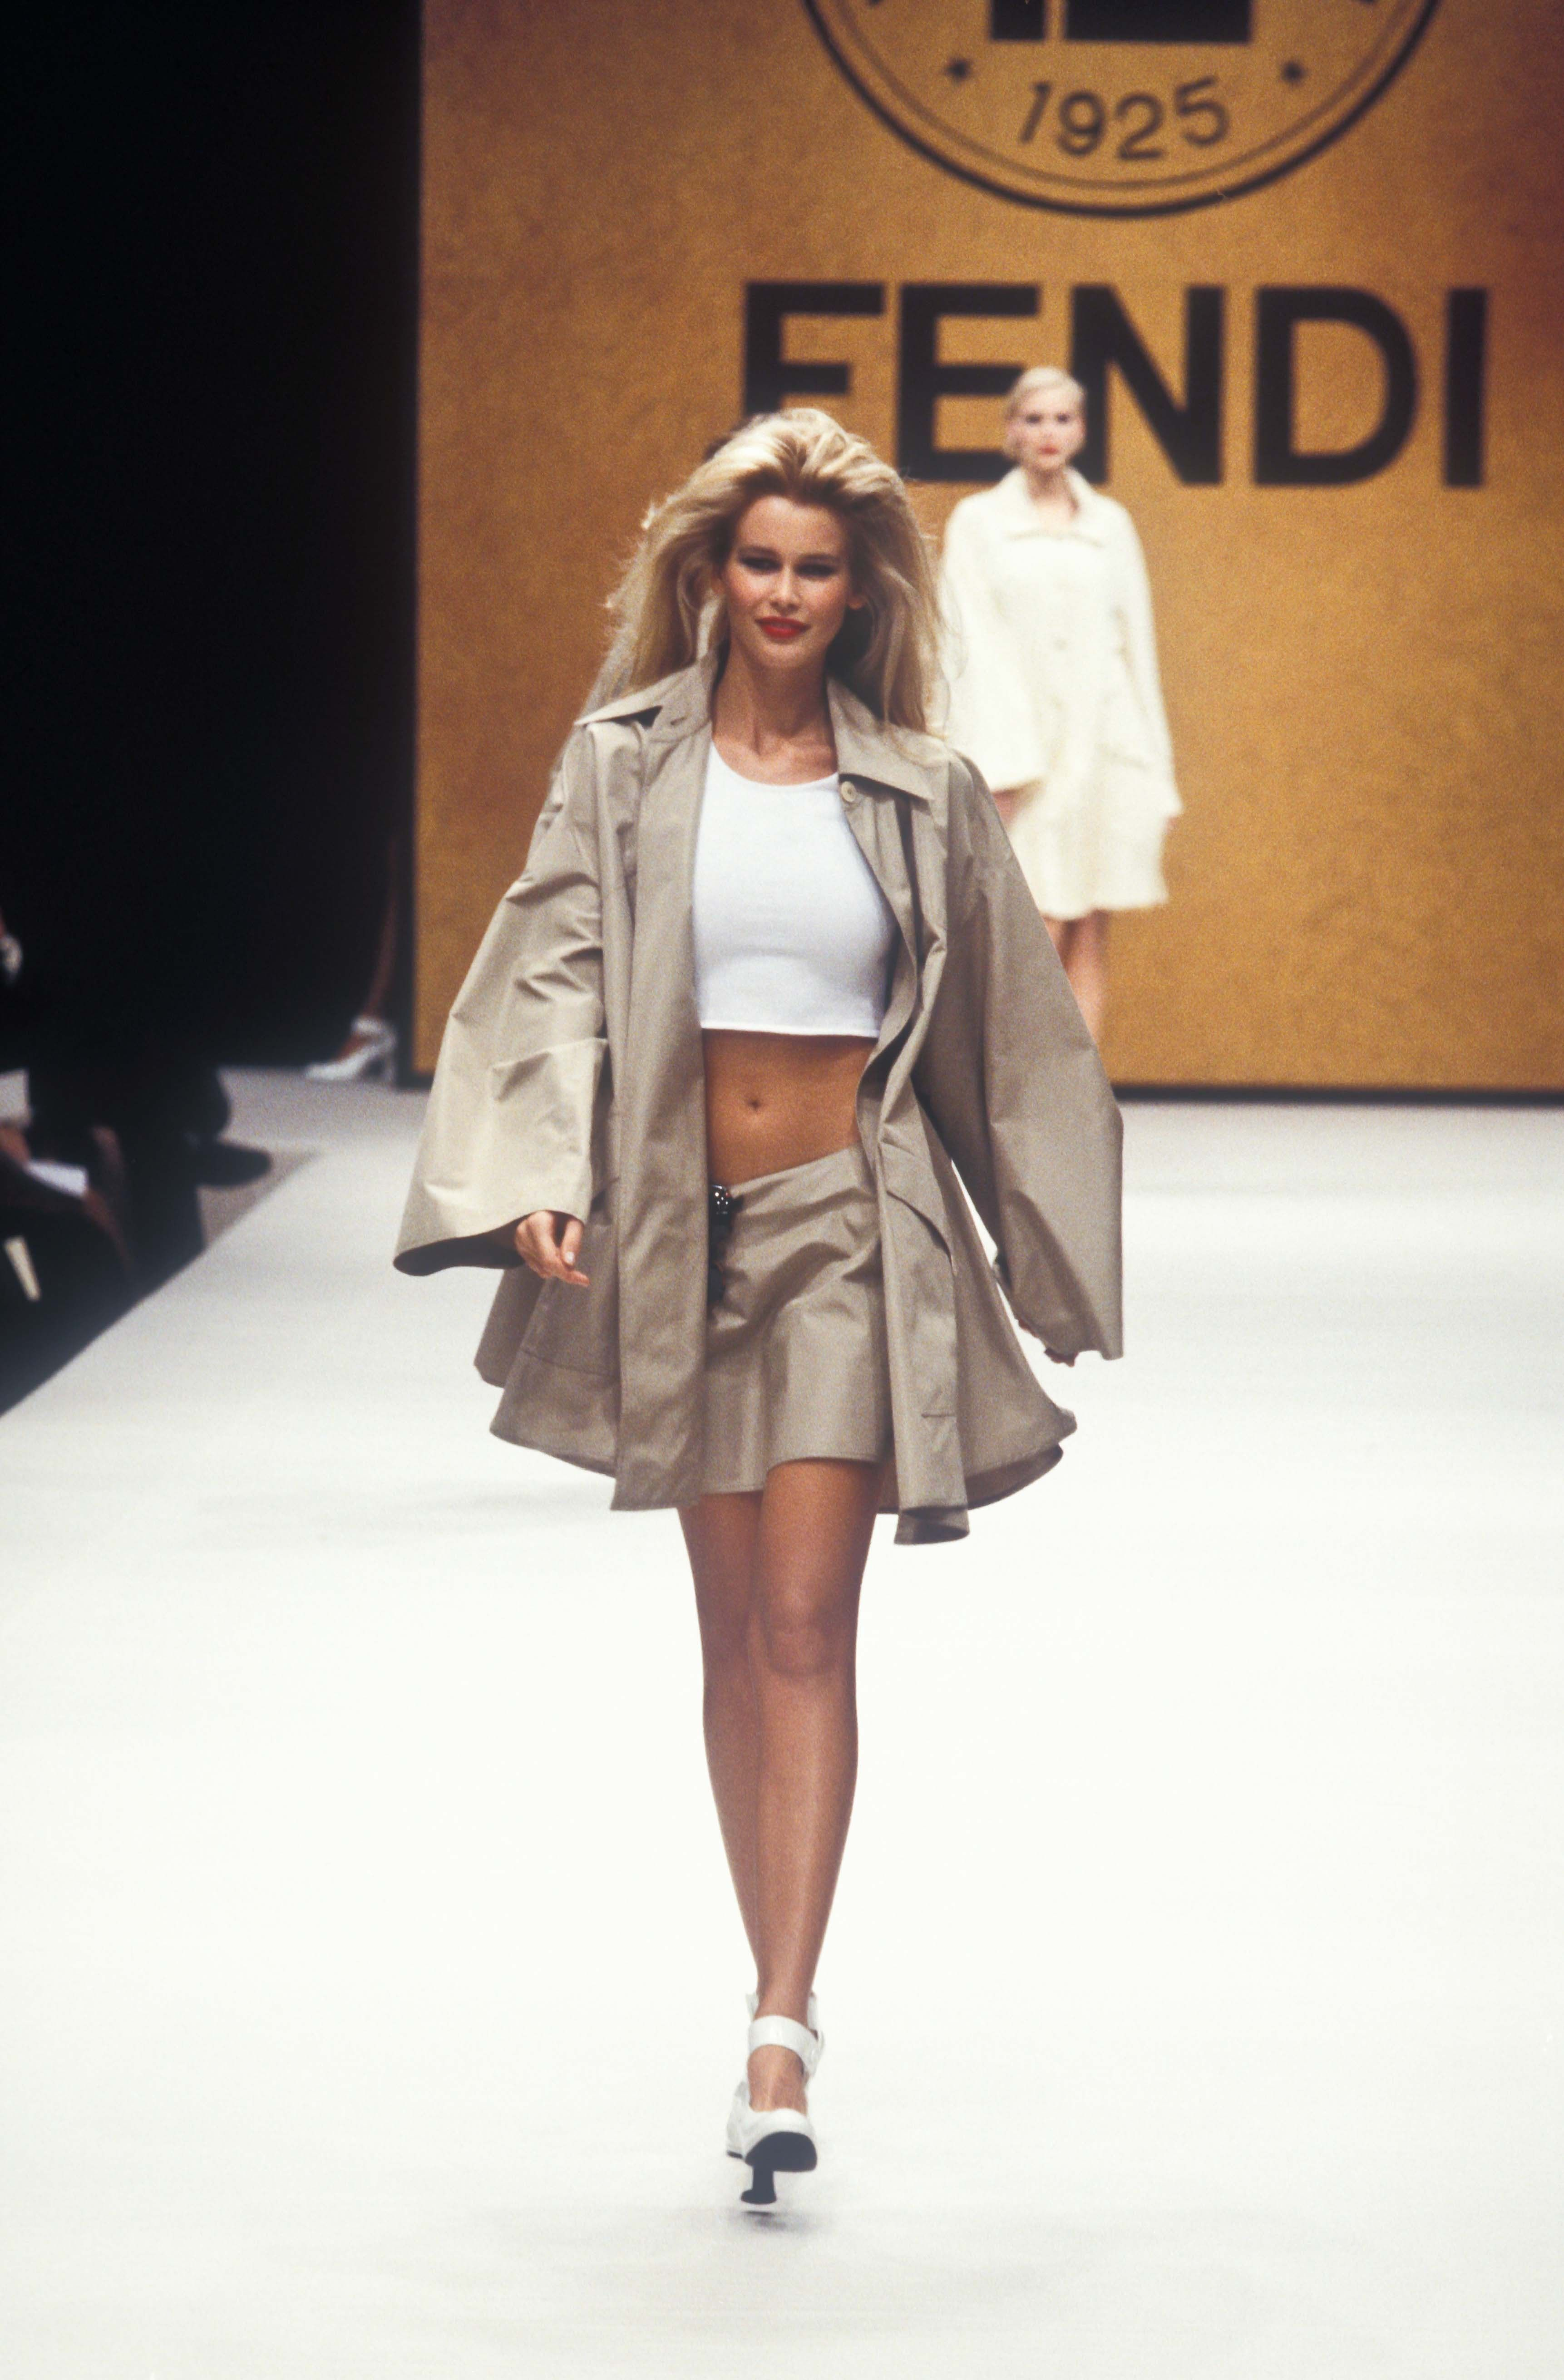 1996 Fendi Furs Fashion Magazine Print Ad: Claudia Schiffer FENDI Runway Show RTW Spring/Summer 1995